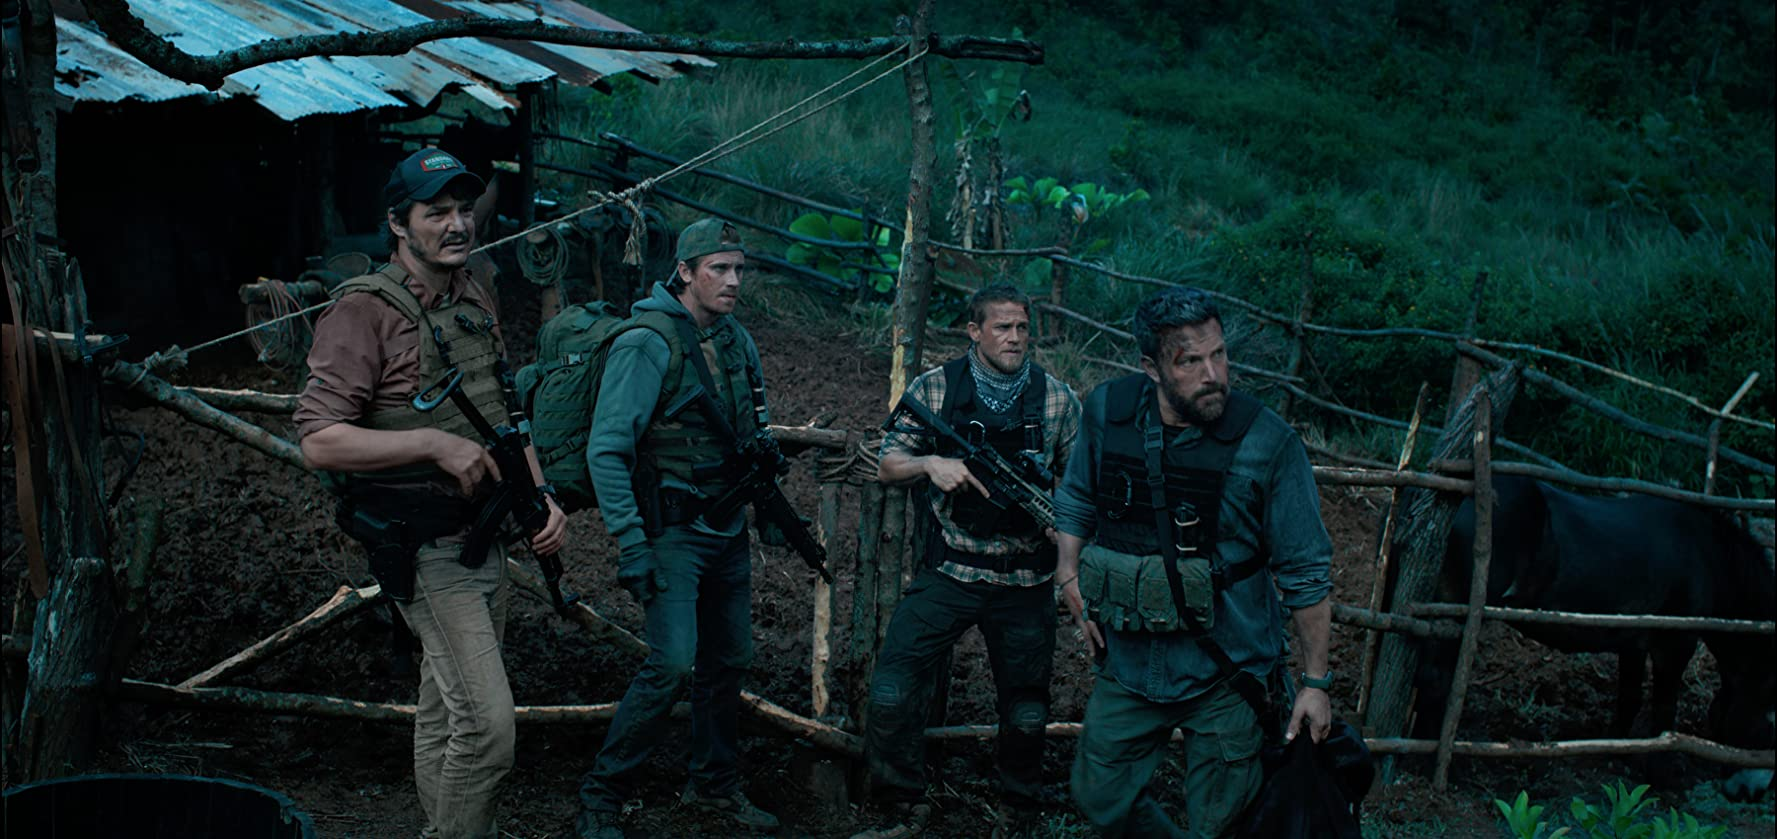 Full Team: Garrett Hedlund, Oscar Isaac, Ben Affleck, Charlie Hunnam and Pedro Pascal in Tripe Frontier (2019)